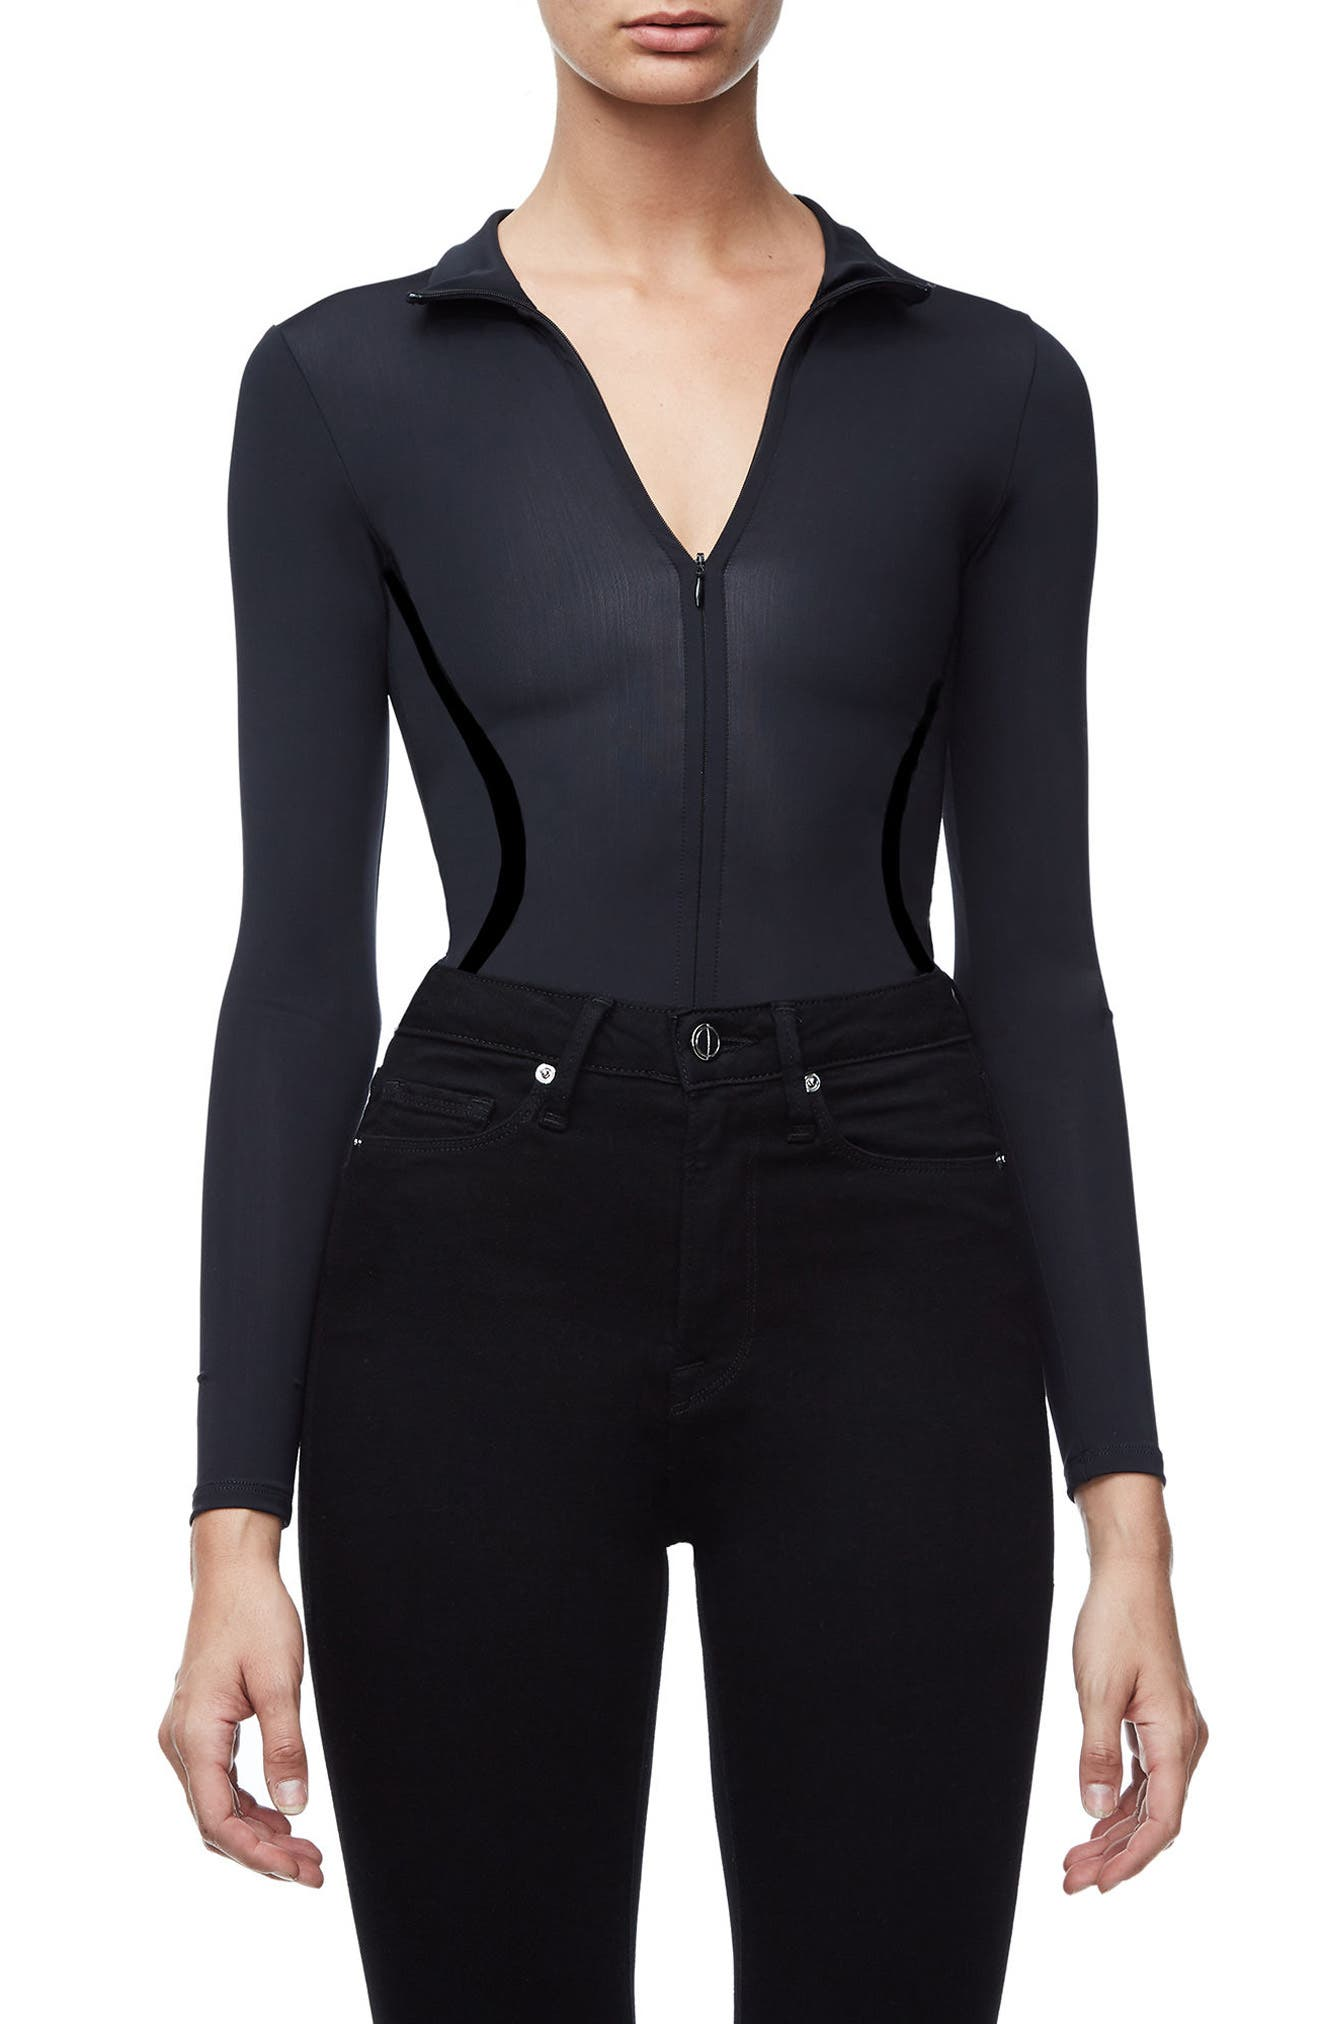 The Slightly Scuba Thong Bodysuit,                             Main thumbnail 1, color,                             Black001